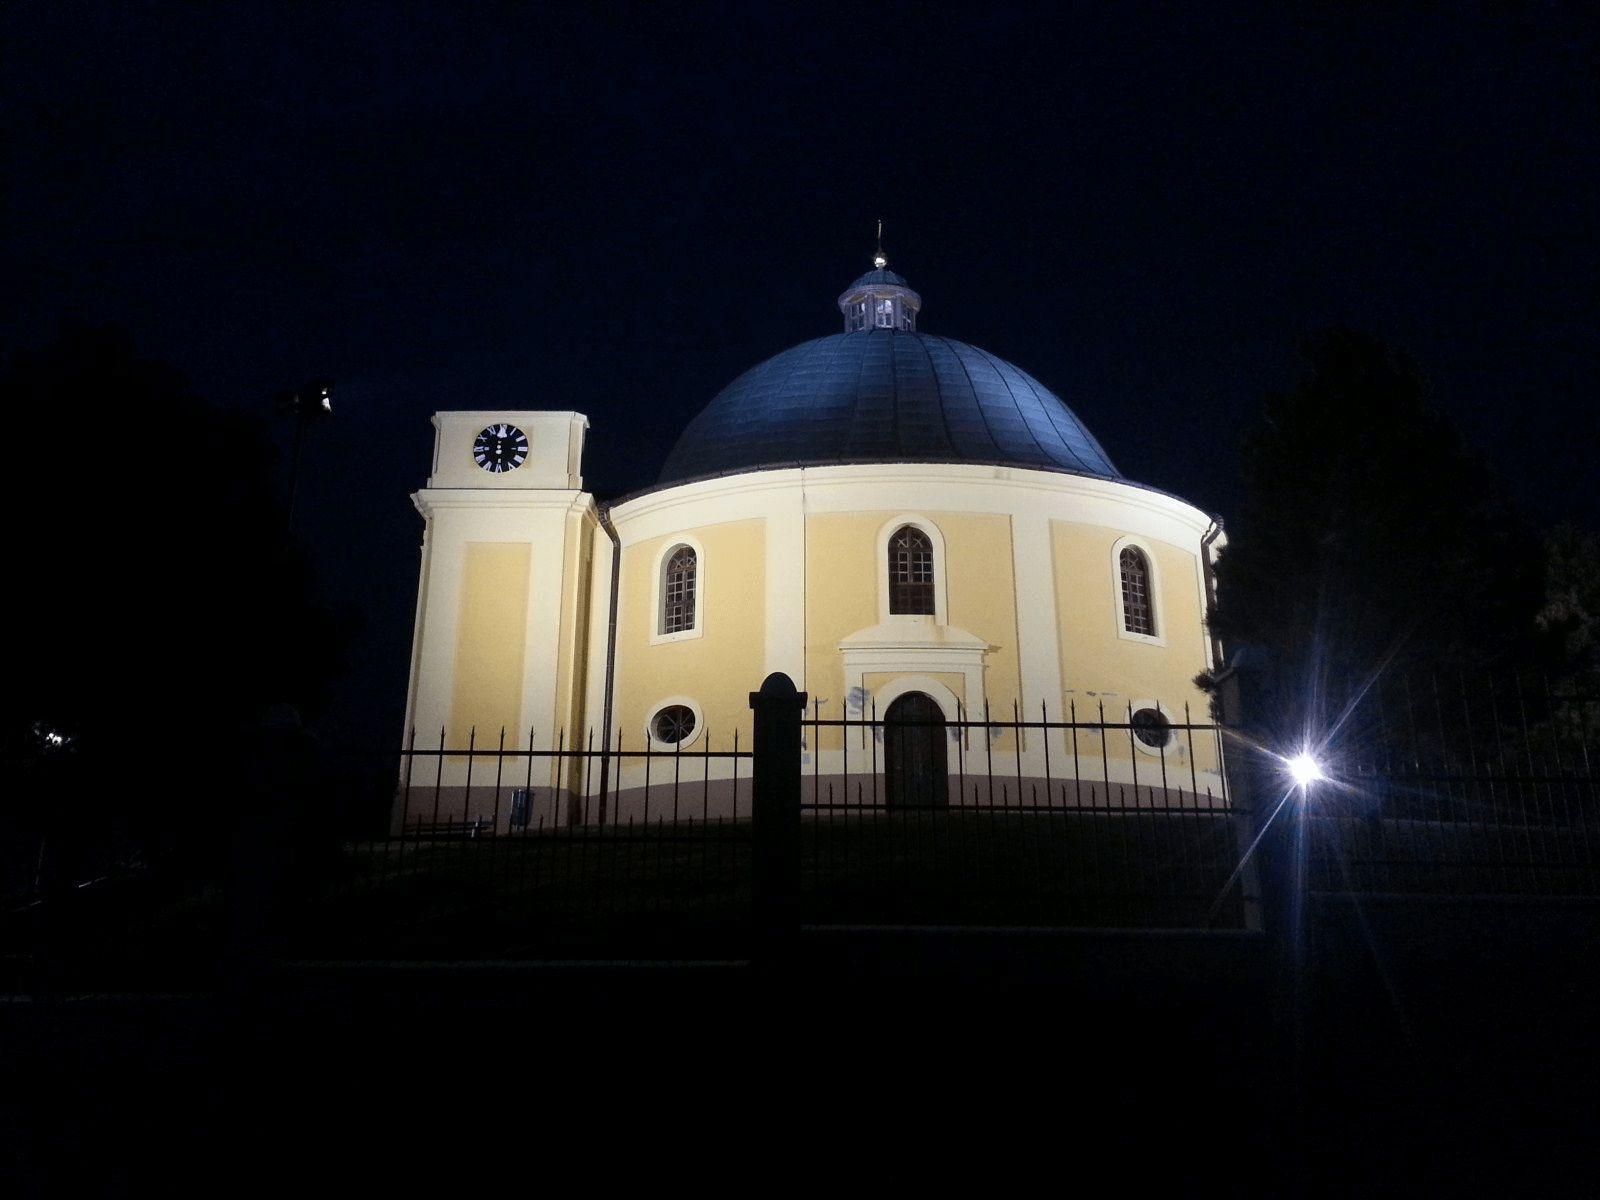 Beograd i Vojvodina: Sremski Karlovci: Kapela mira